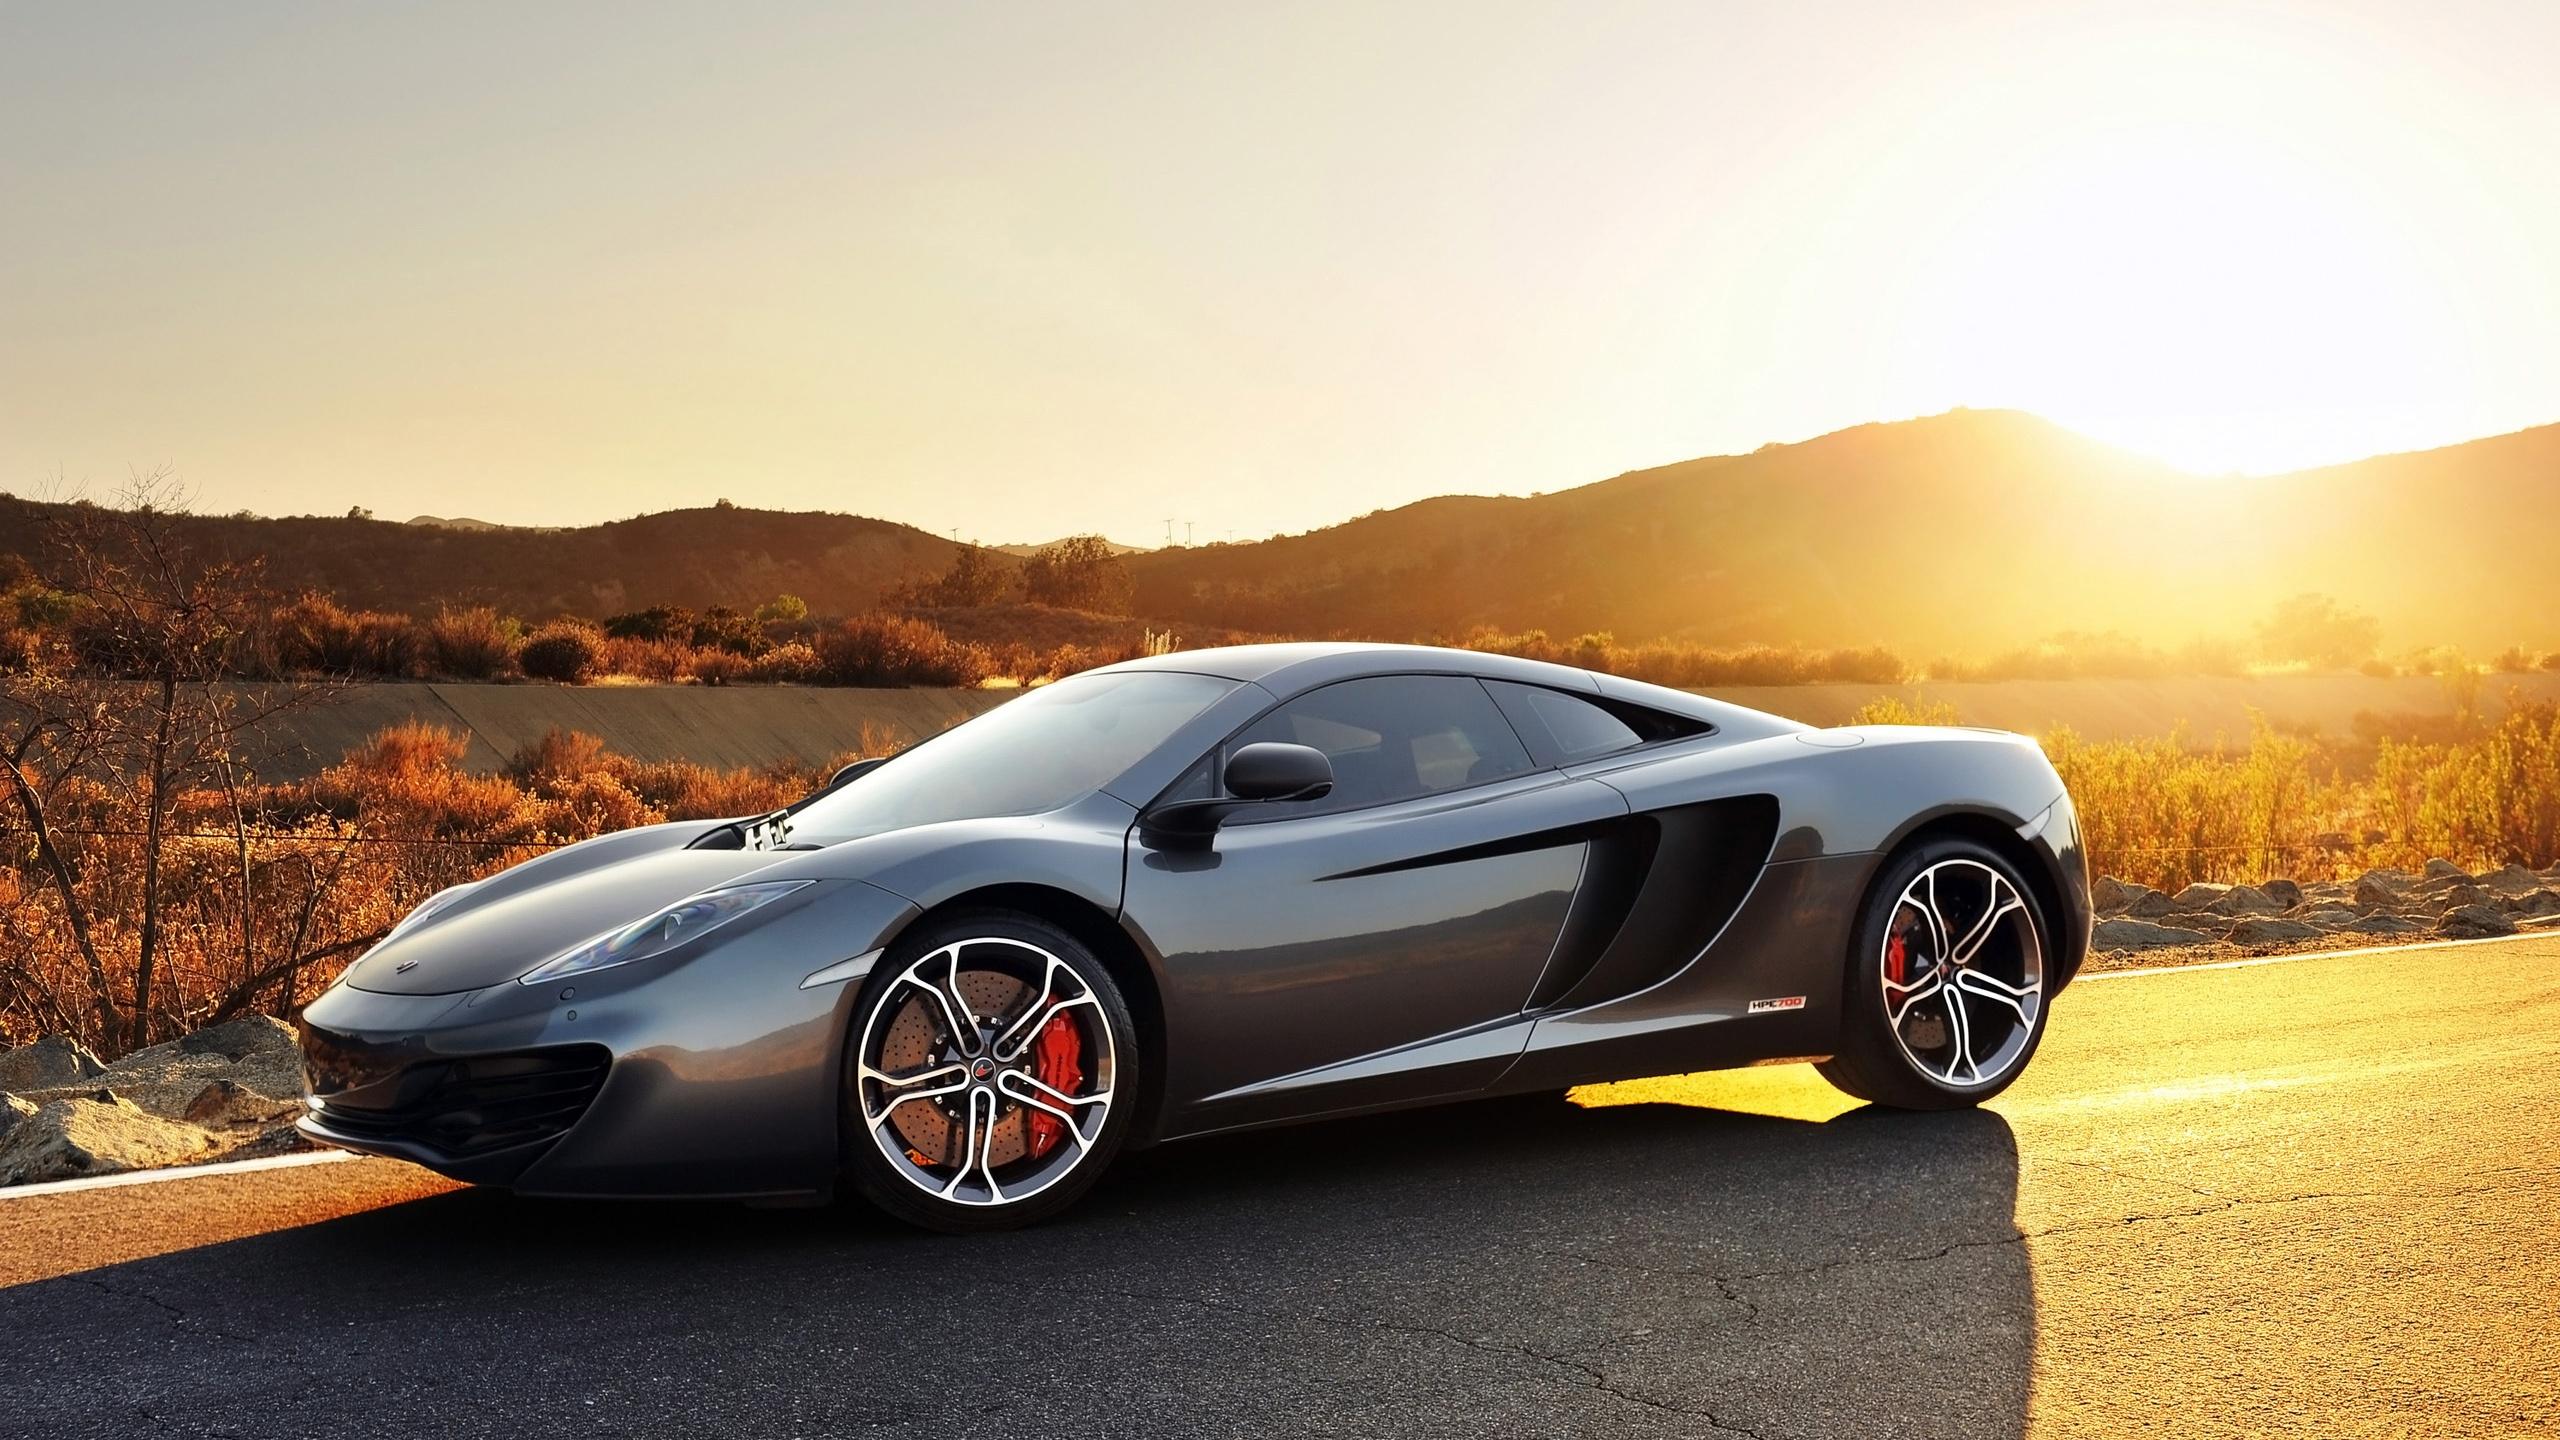 15 Fantastic HD McLaren Wallpapers